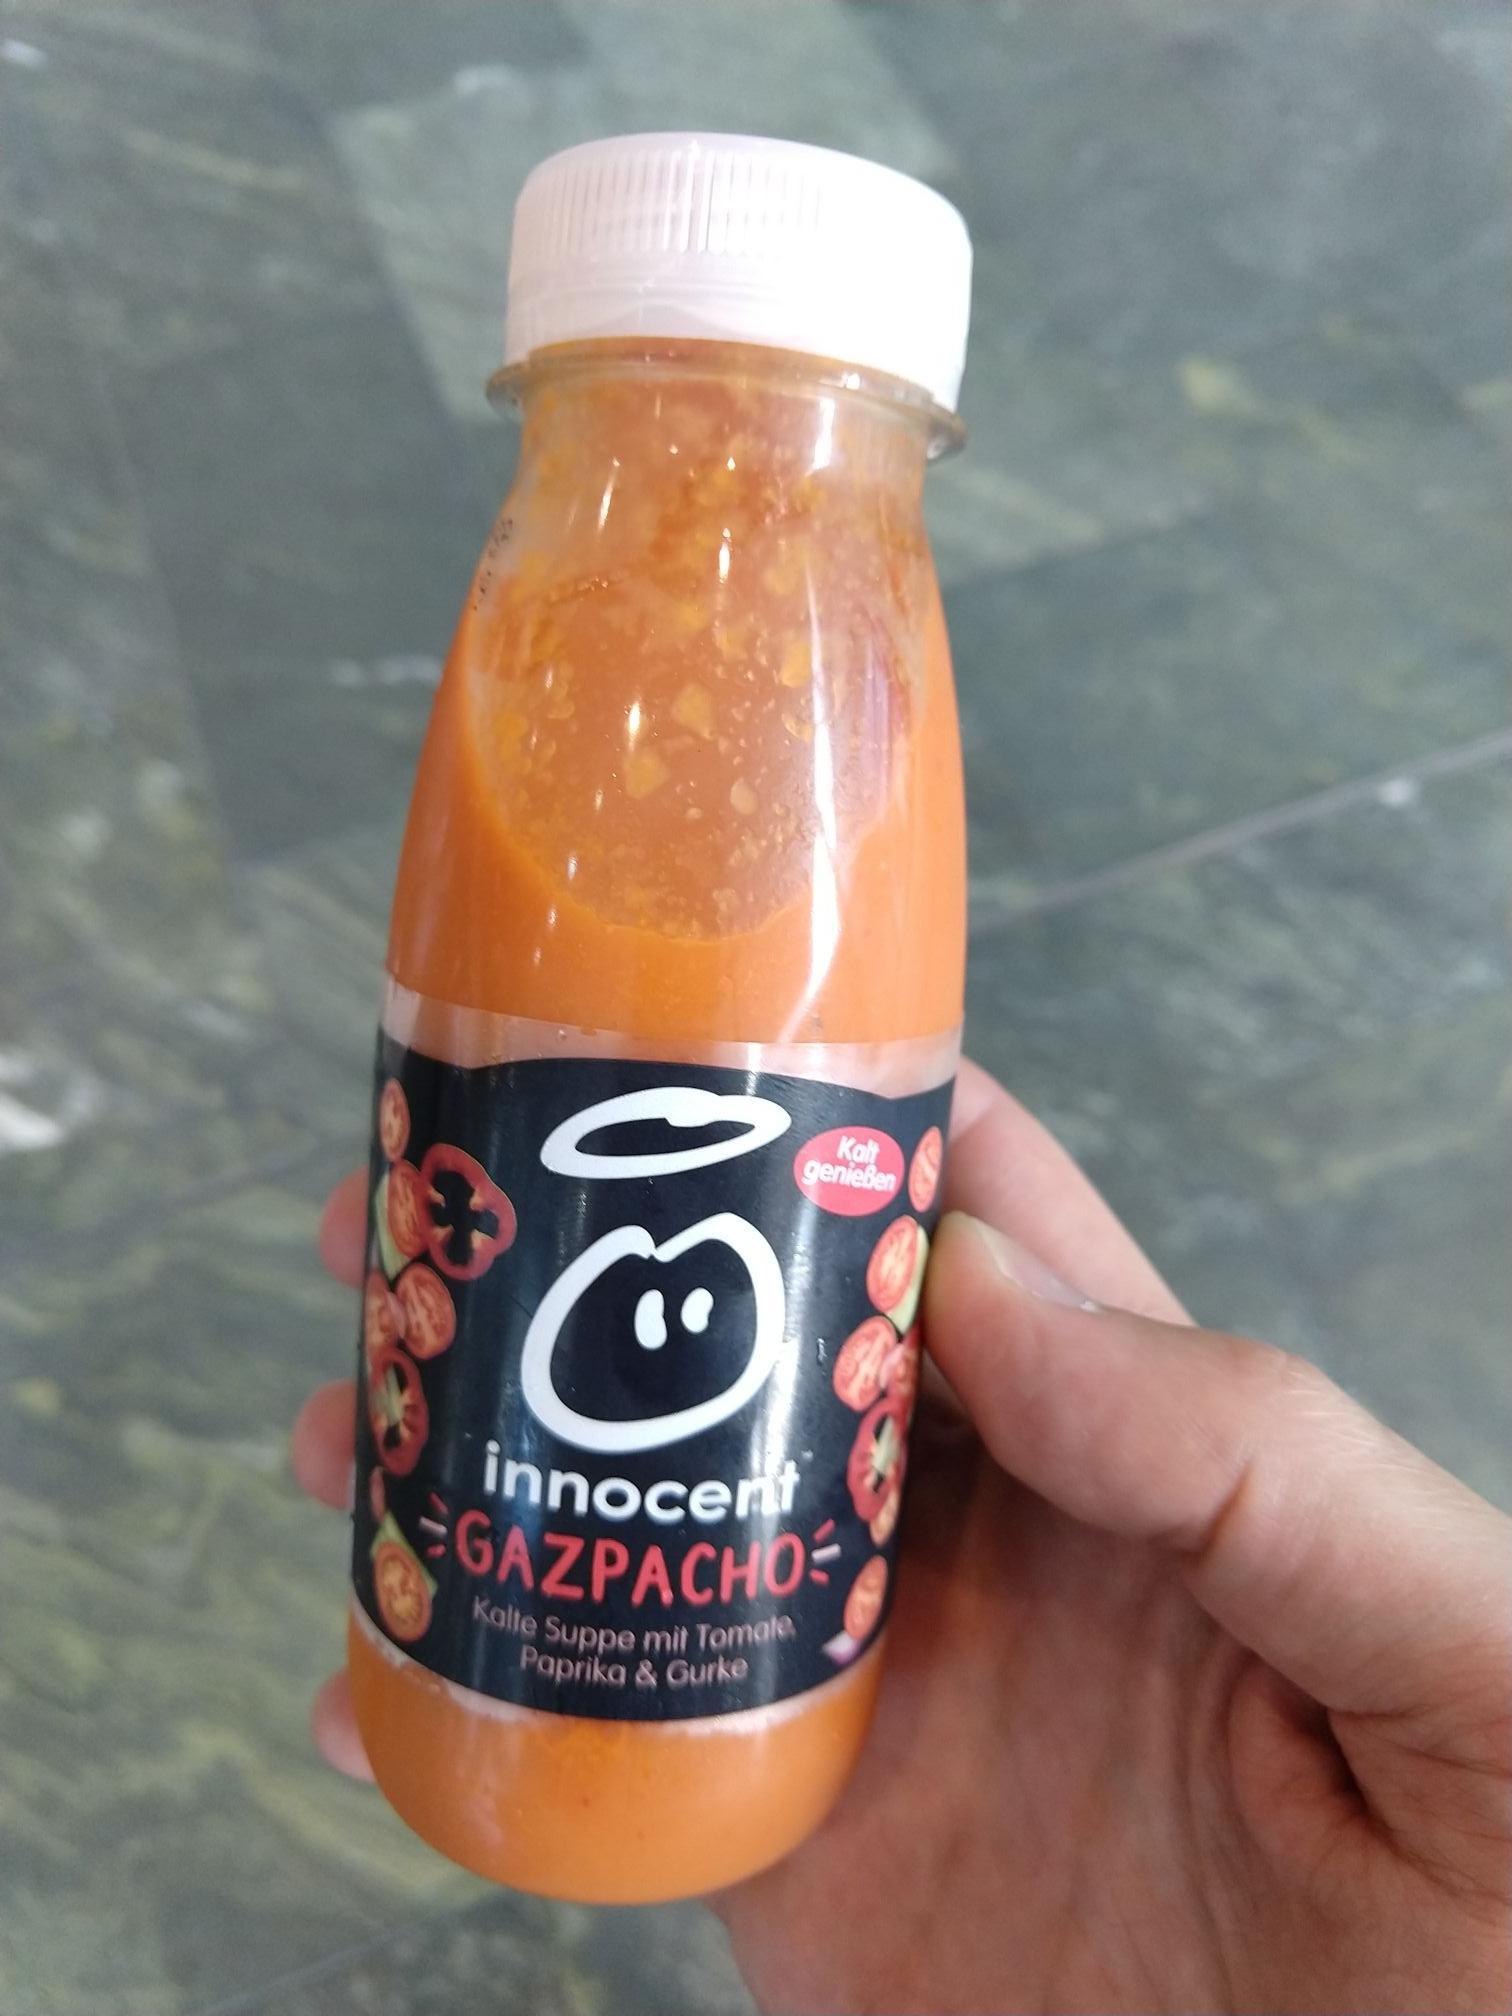 innocent Gazpacho 250ml for free